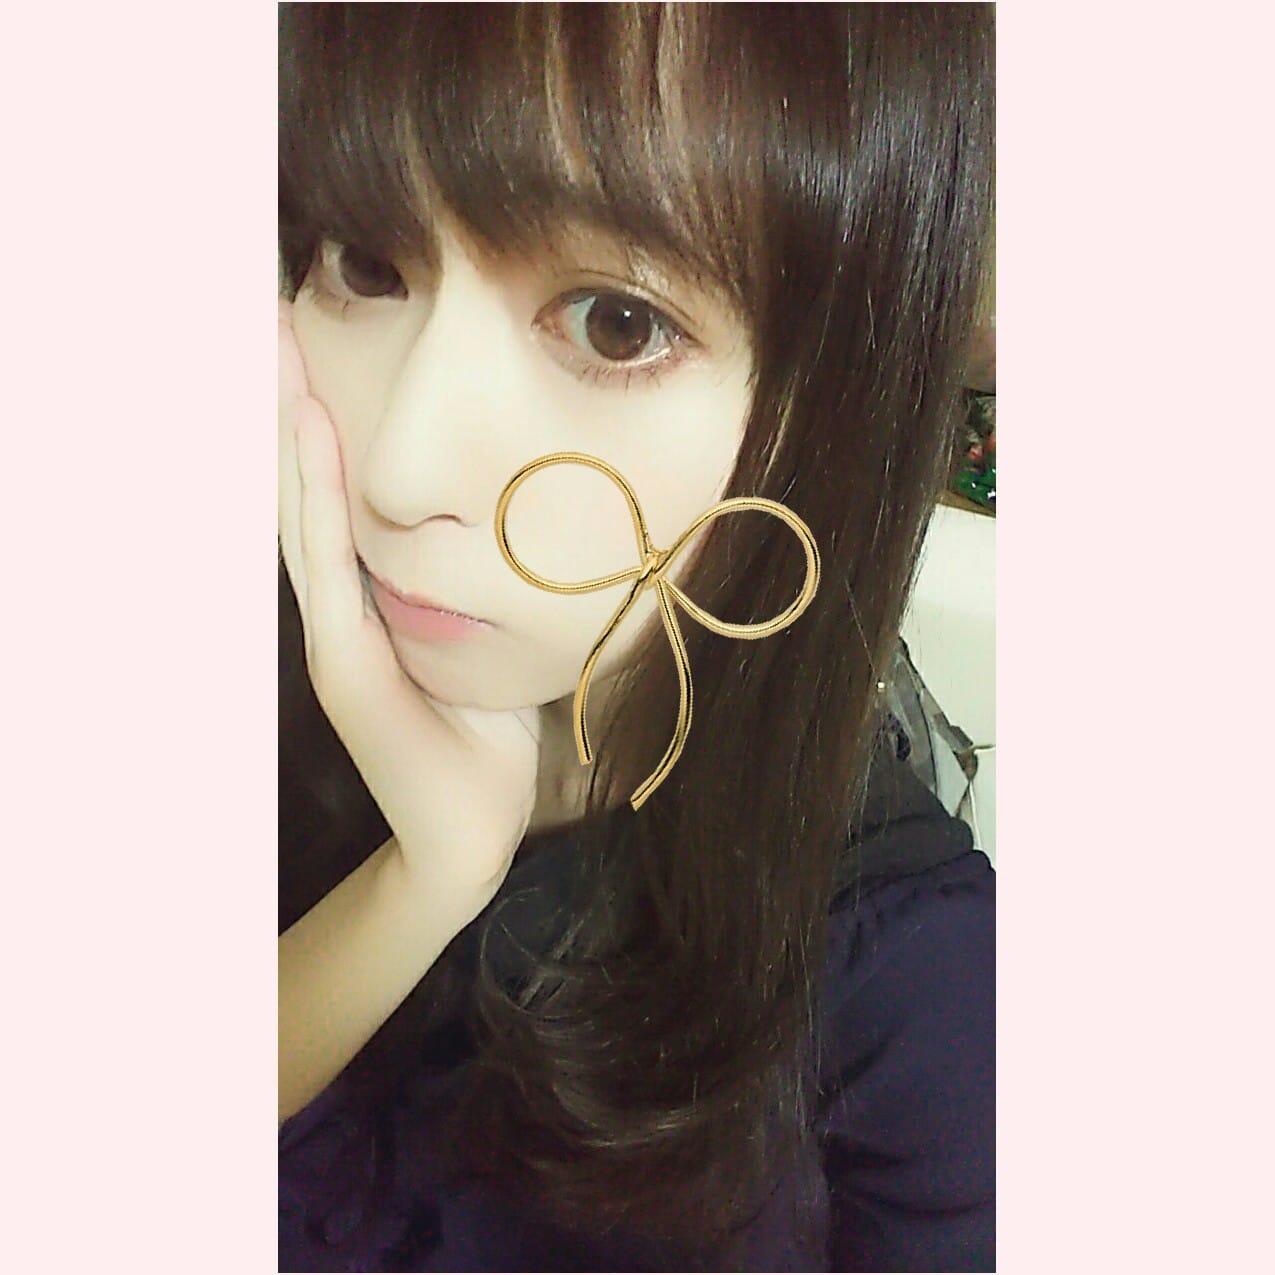 RINA【りな】「おれい」03/21(水) 03:01 | RINA【りな】の写メ・風俗動画